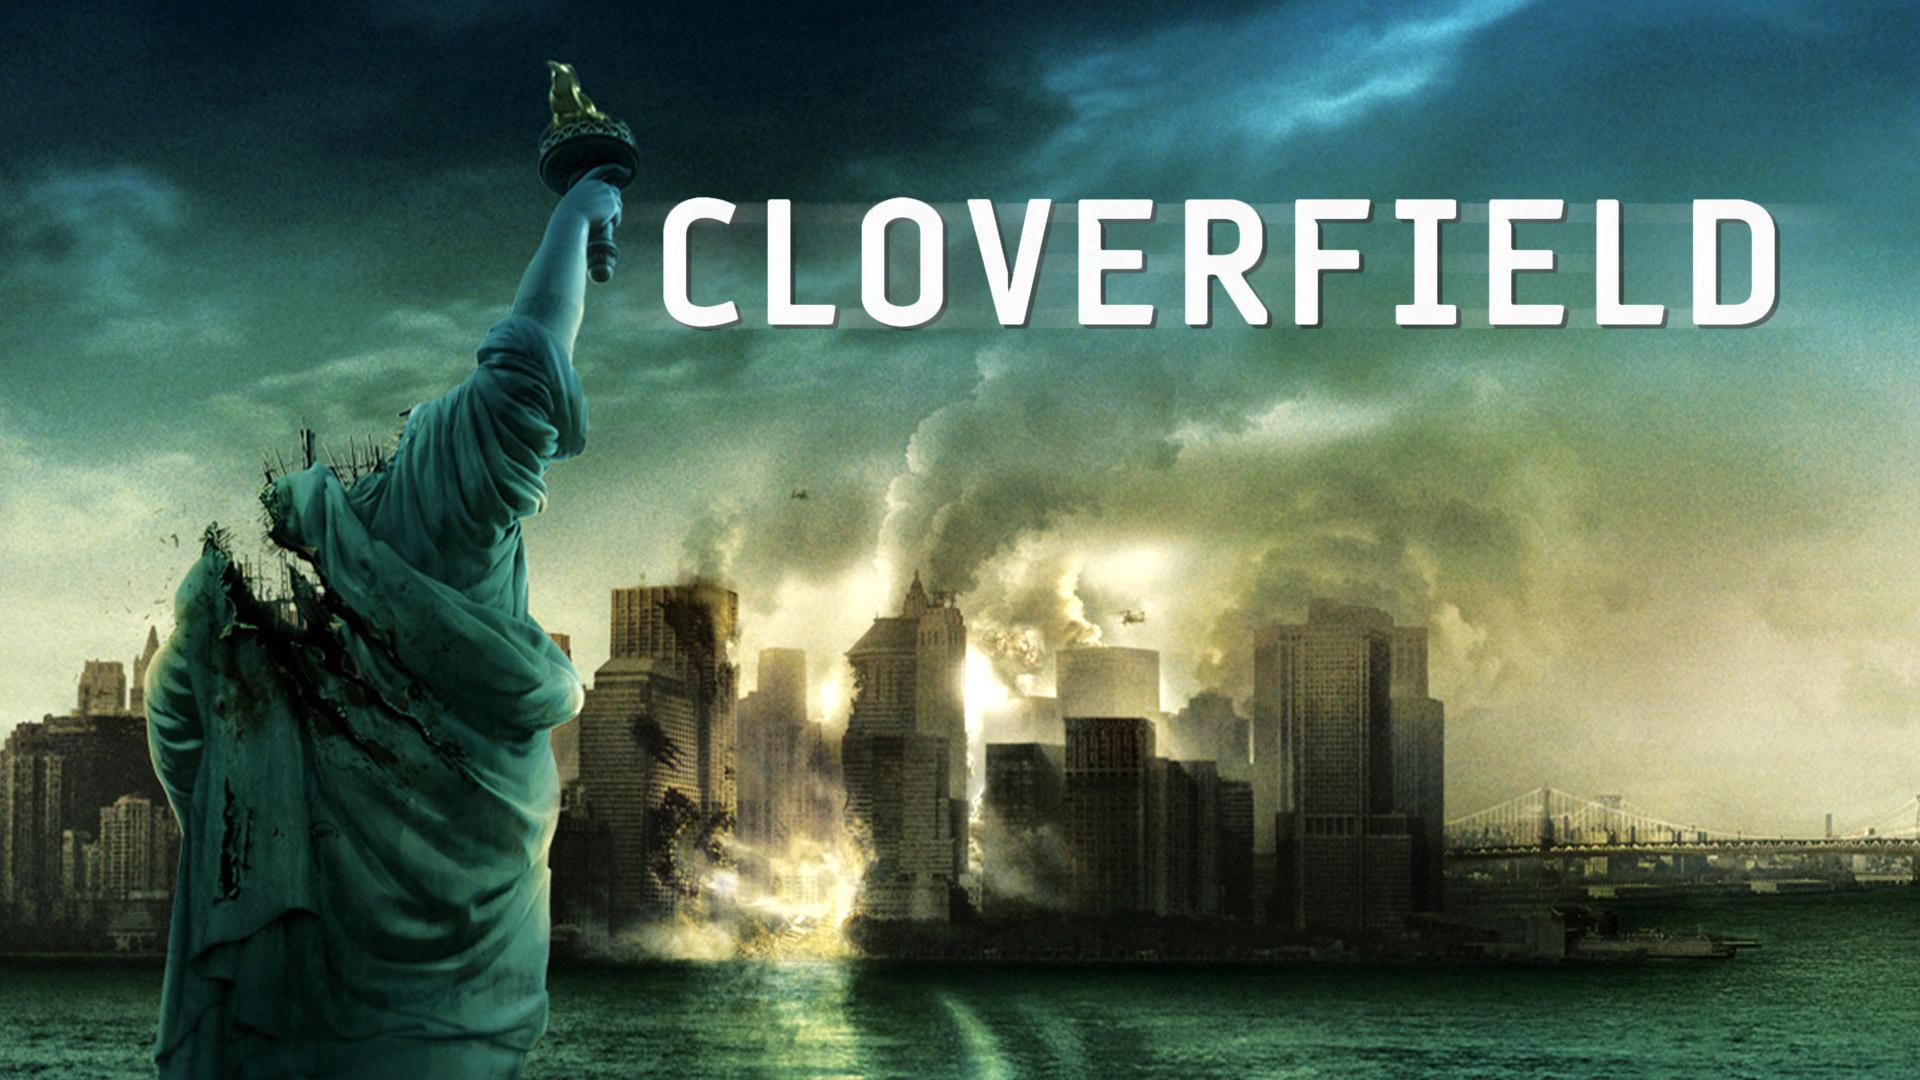 Cloverfield (4K UHD)